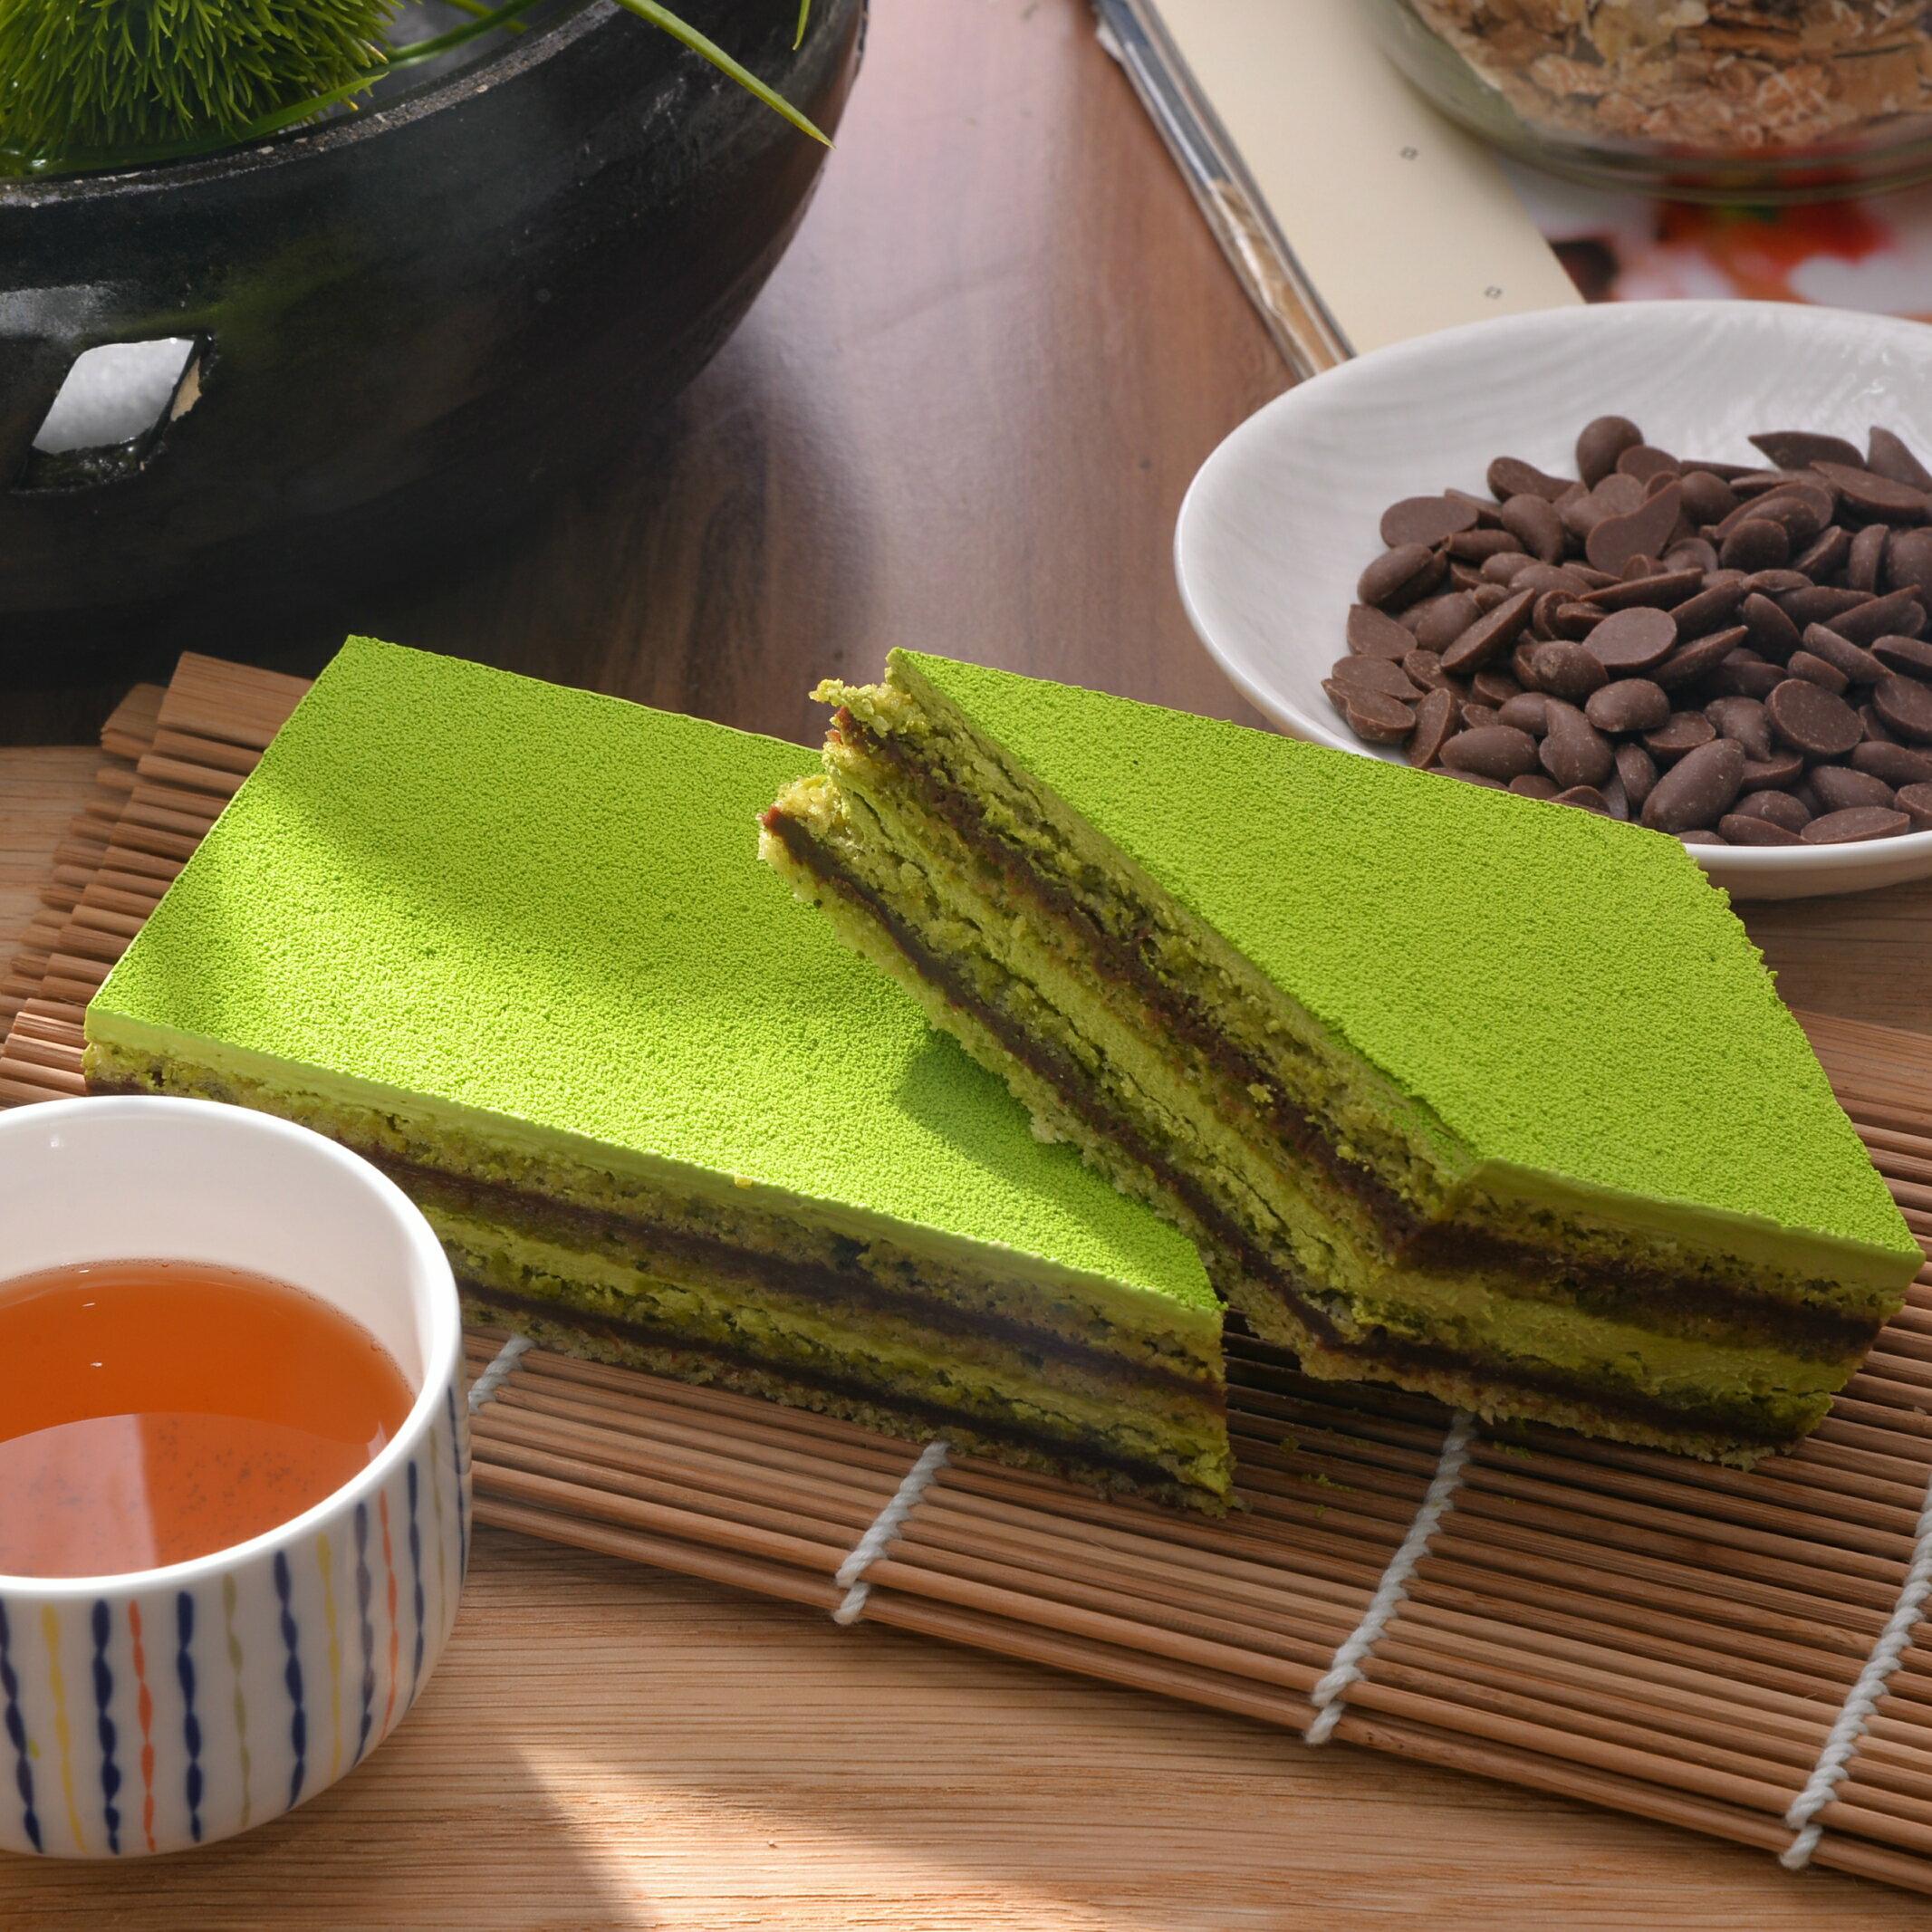 【Sara-Cake烘焙坊】靜岡抹茶巧克力長條蛋糕(單條250g)